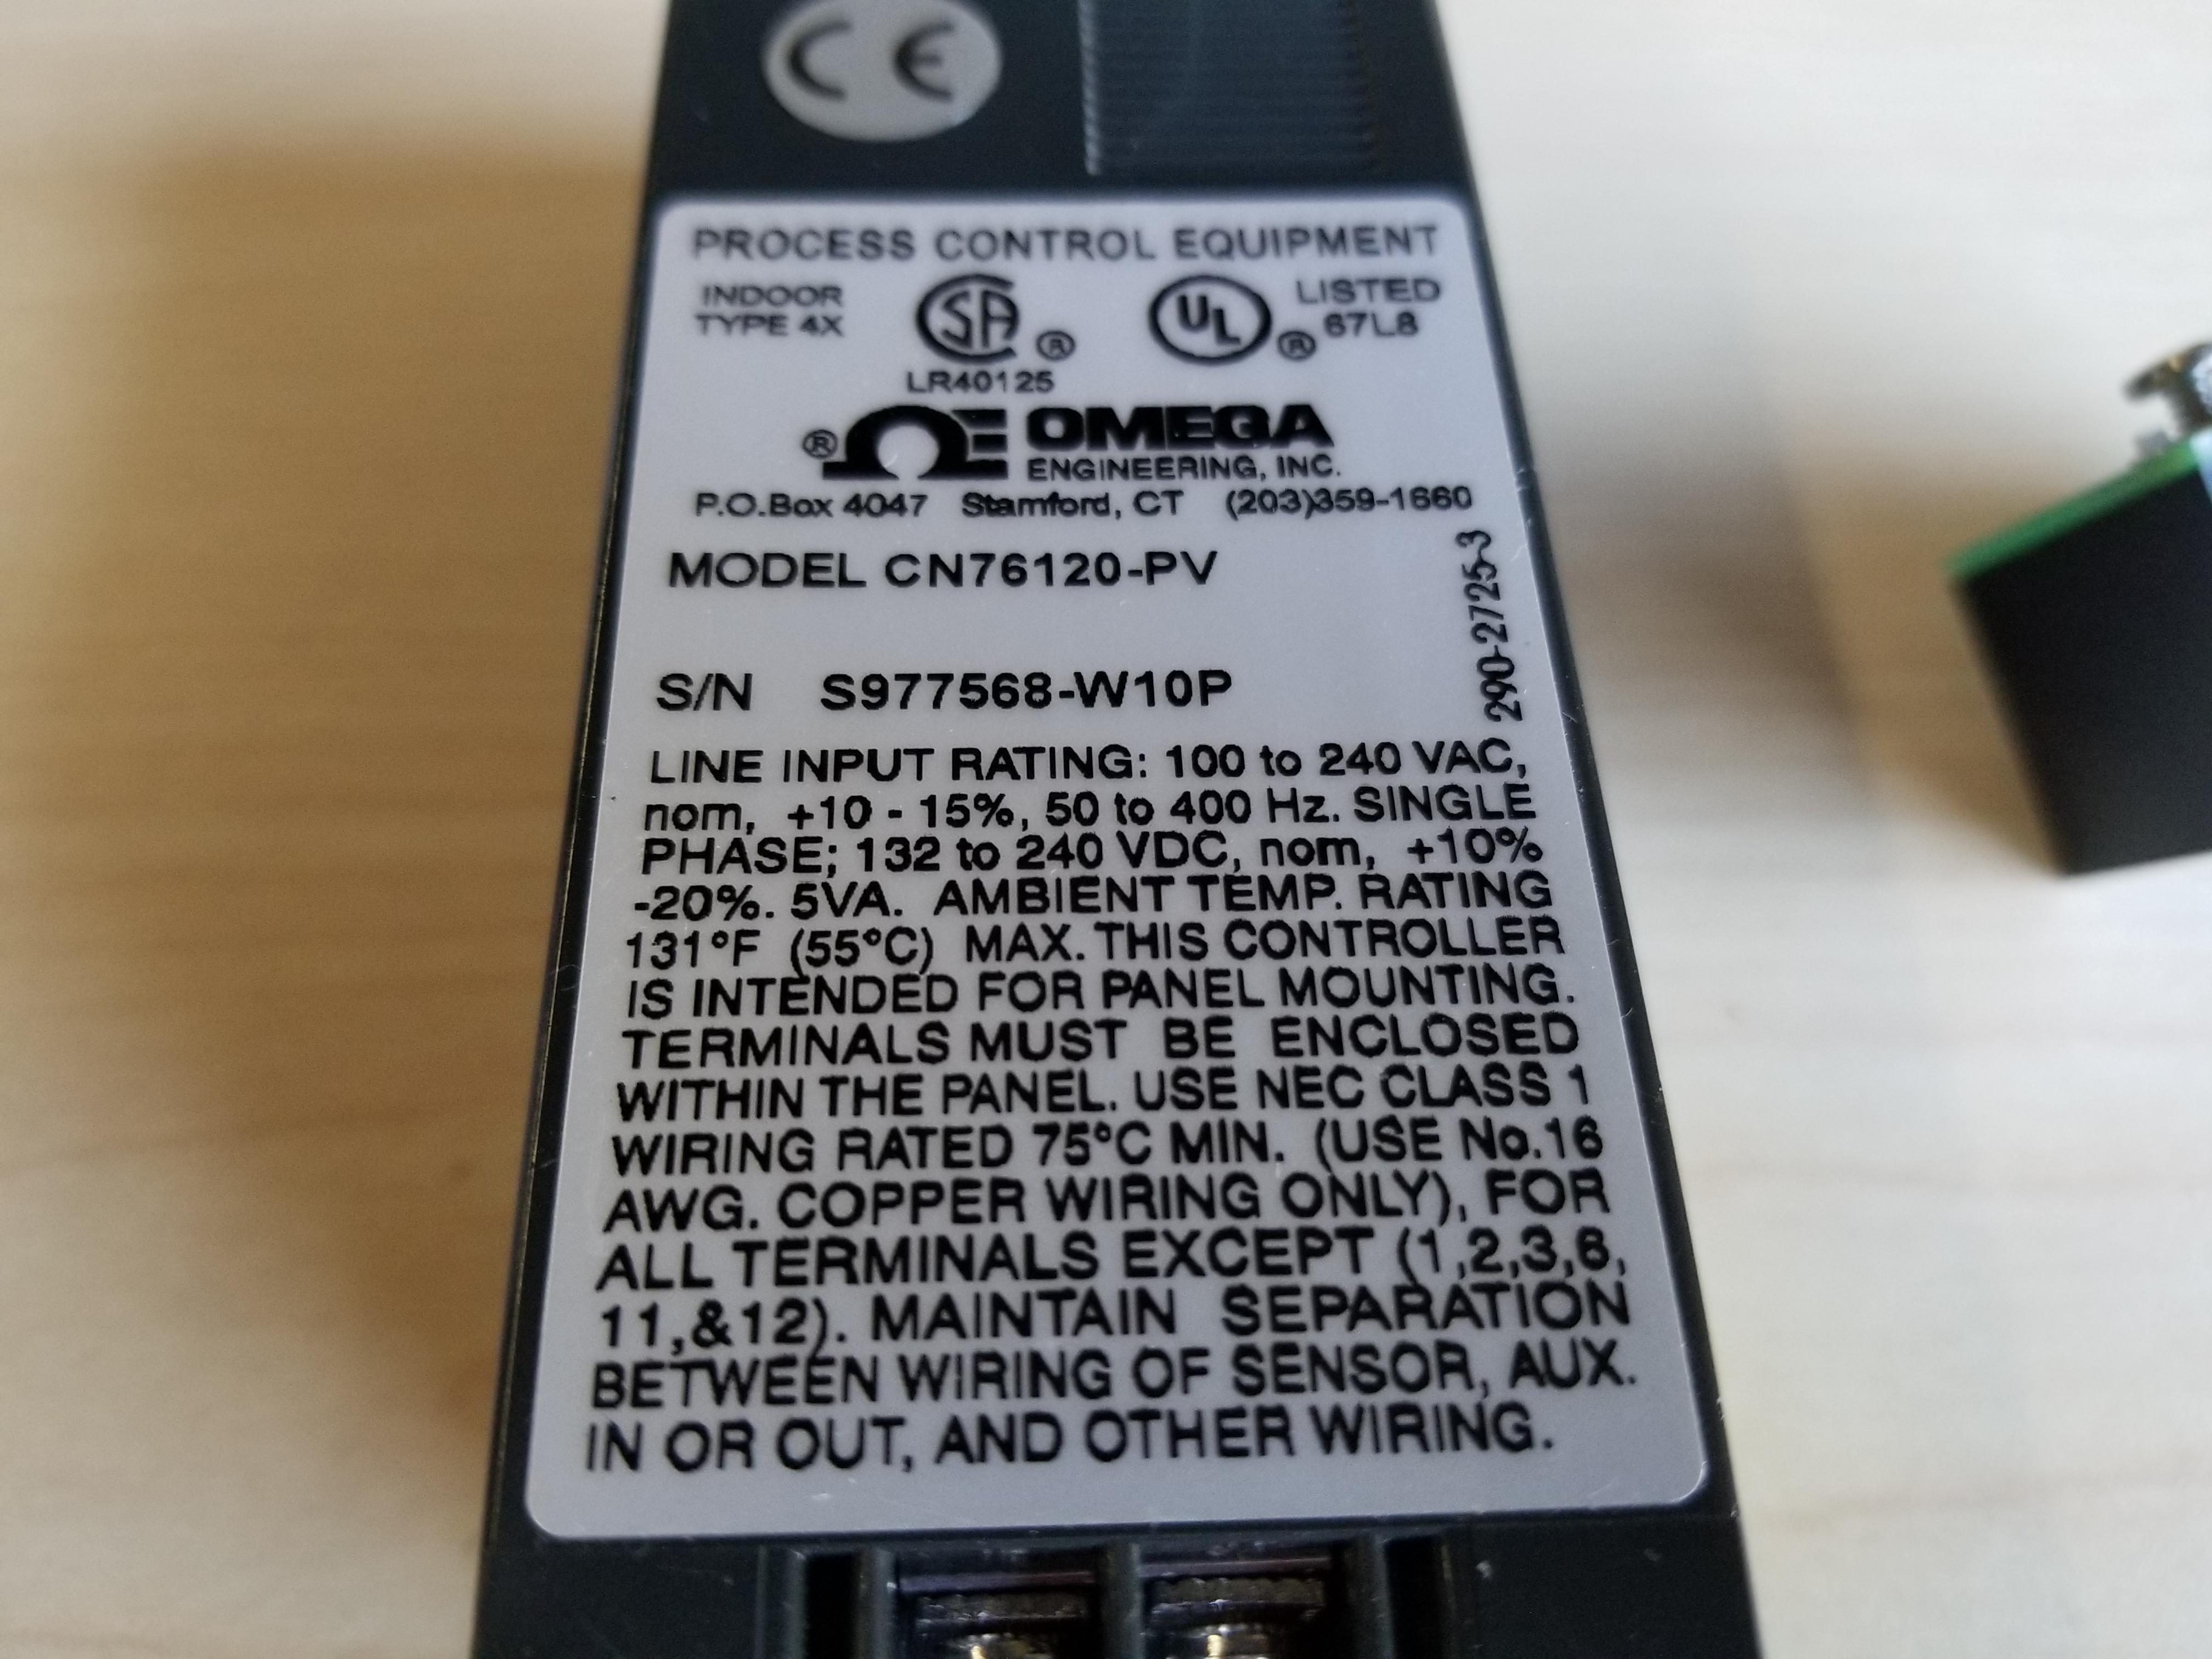 New Omega 1/16 DIN PID Autotune Temperature Controller - Image 3 of 4